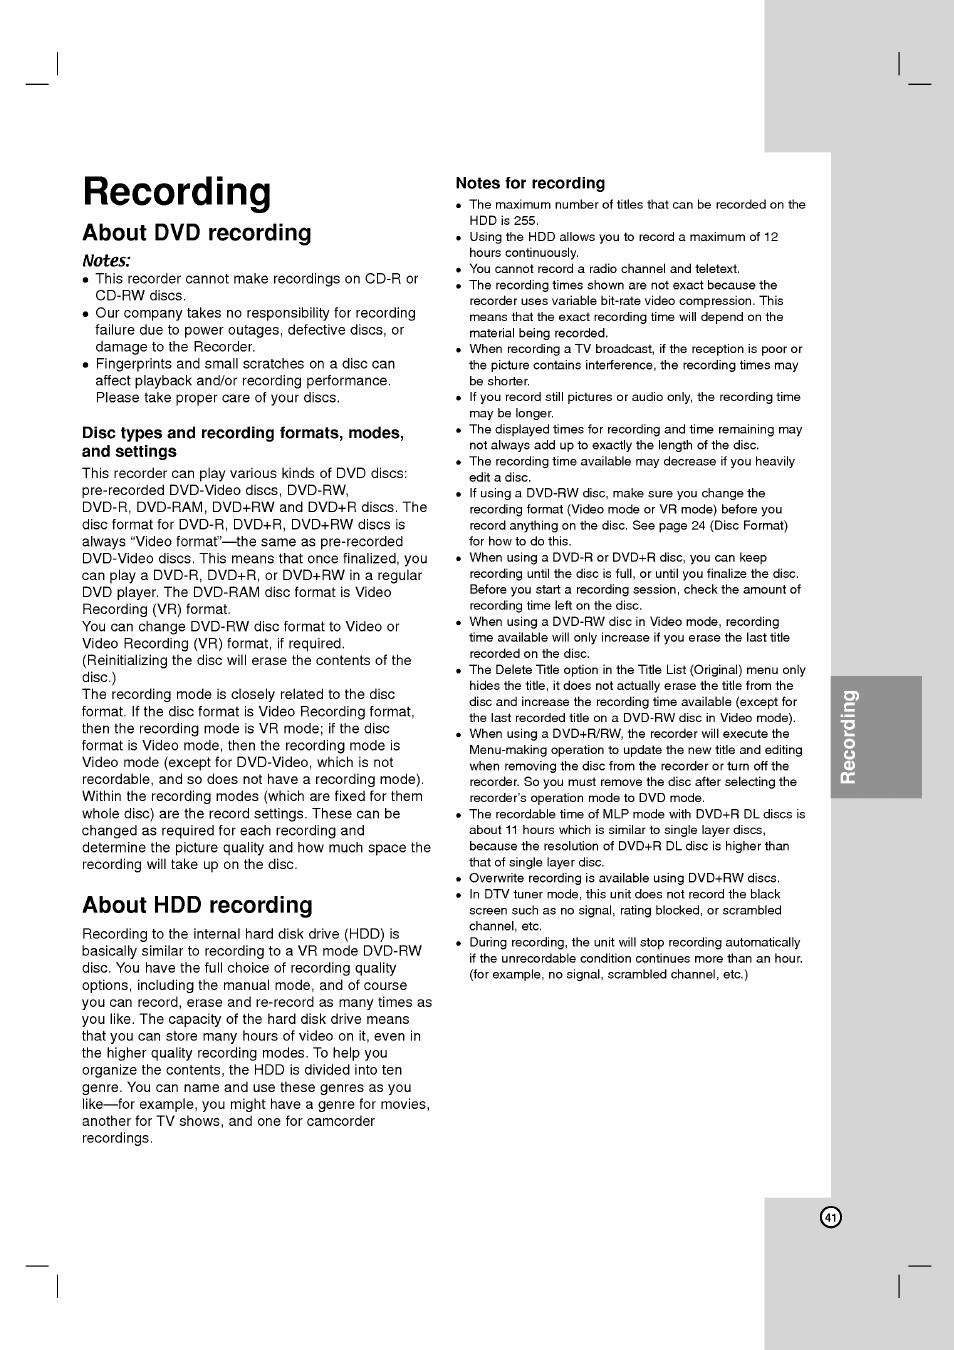 recording about dvd recording notes lg rh2t160 user manual rh manualsdir com